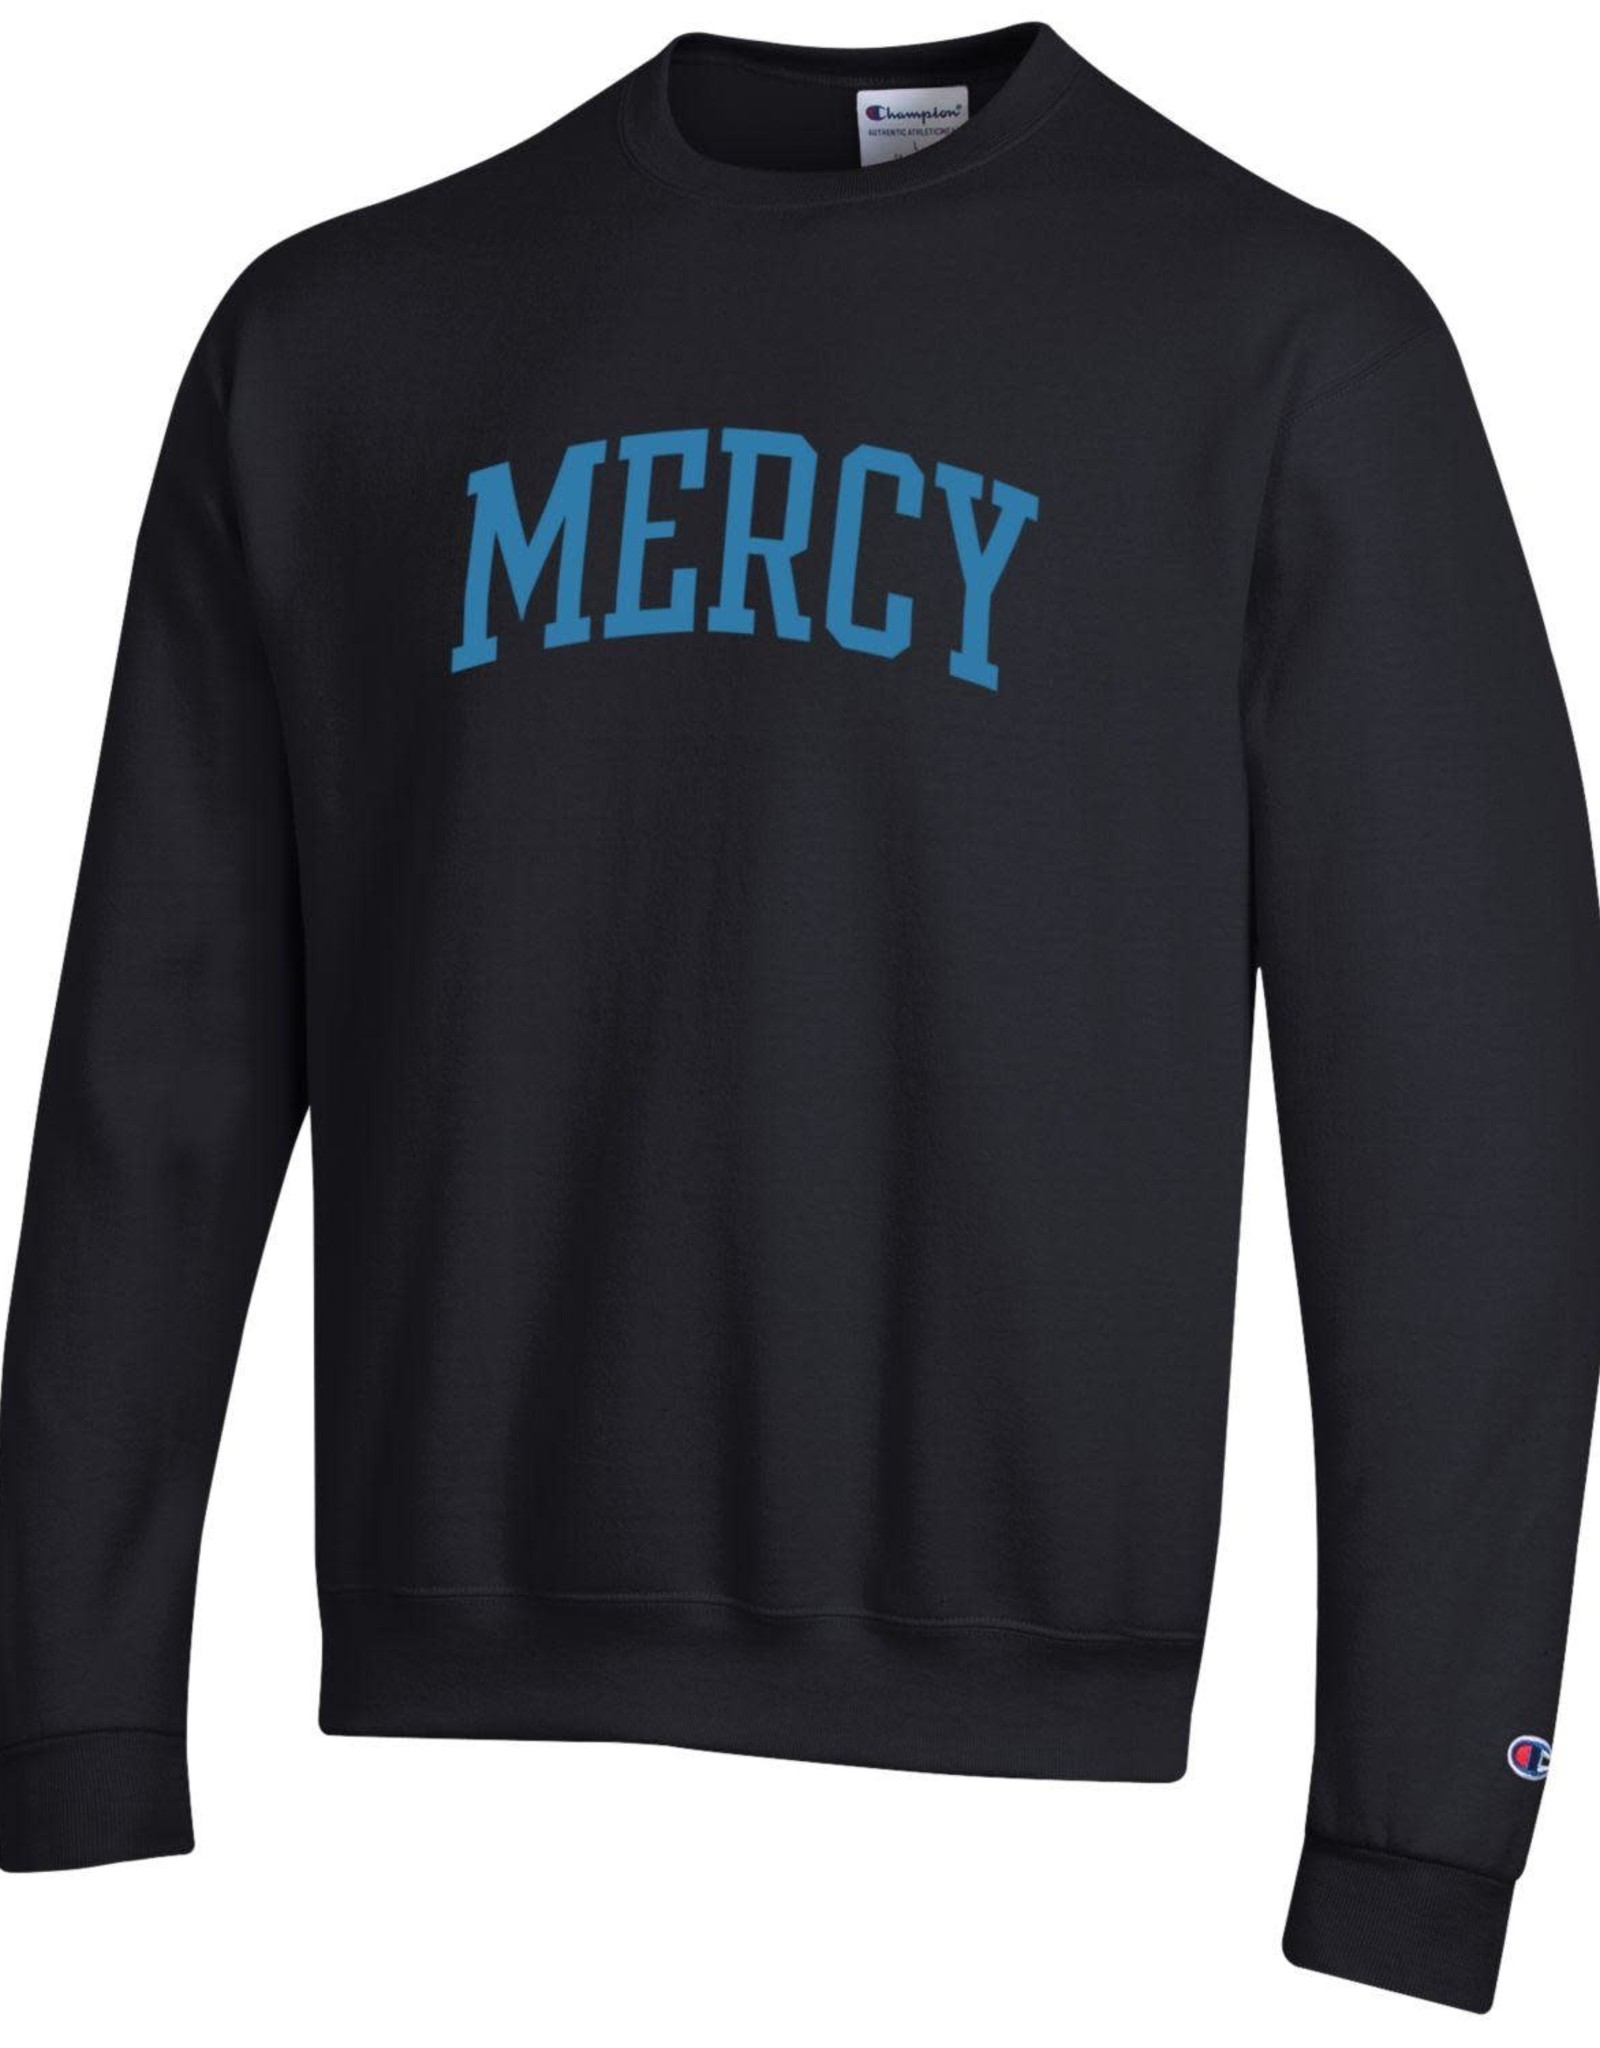 CHAMPION Mercy Embroidered Black Crewneck Sweatshirt